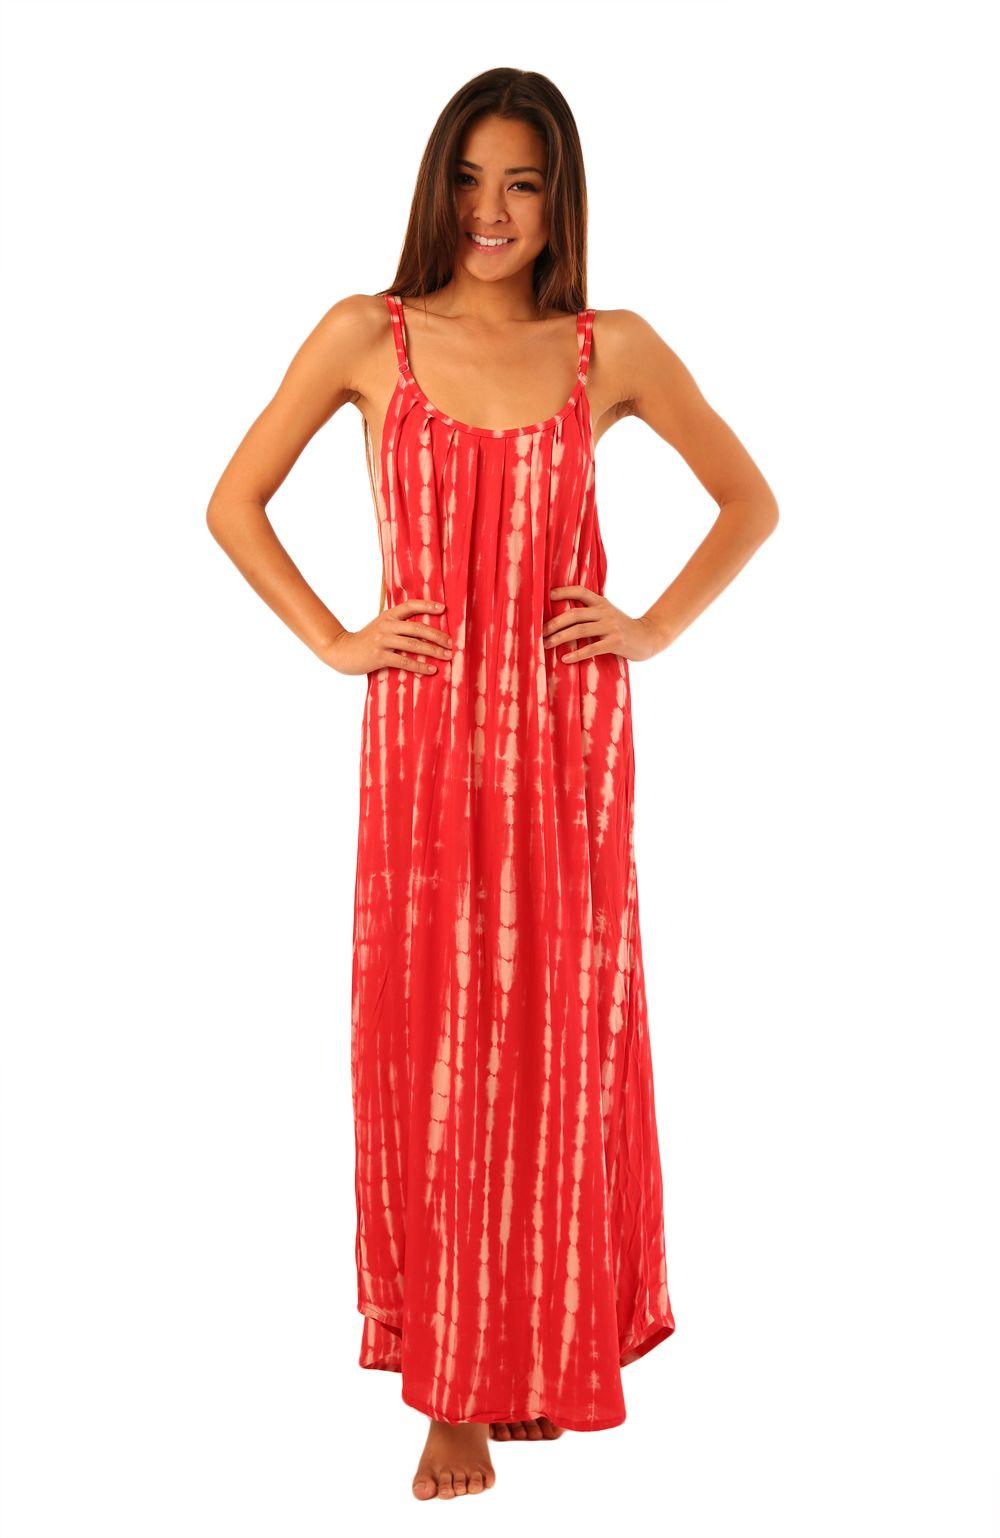 NEW! 2015 KILIA <br> Gesper Long Dress